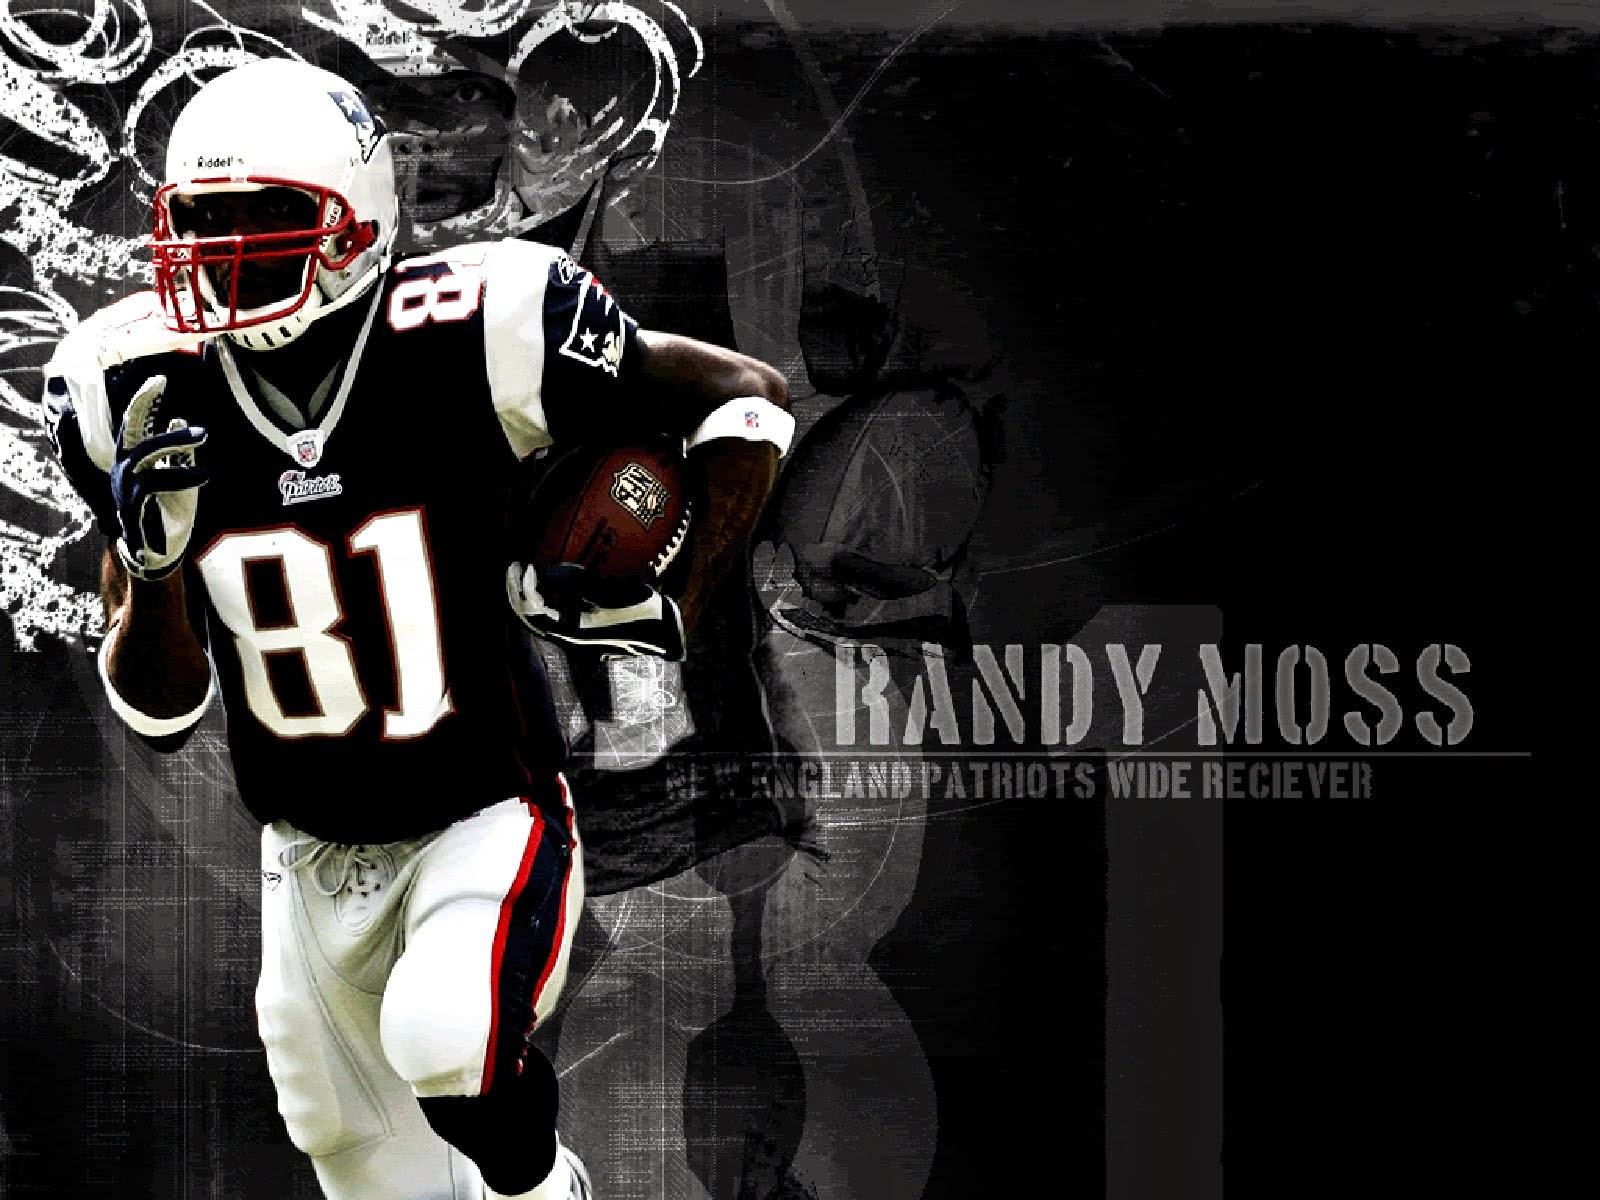 American Football Player Wallpaper: Wallpapers: American Football Player Randy Moss Wallpapers